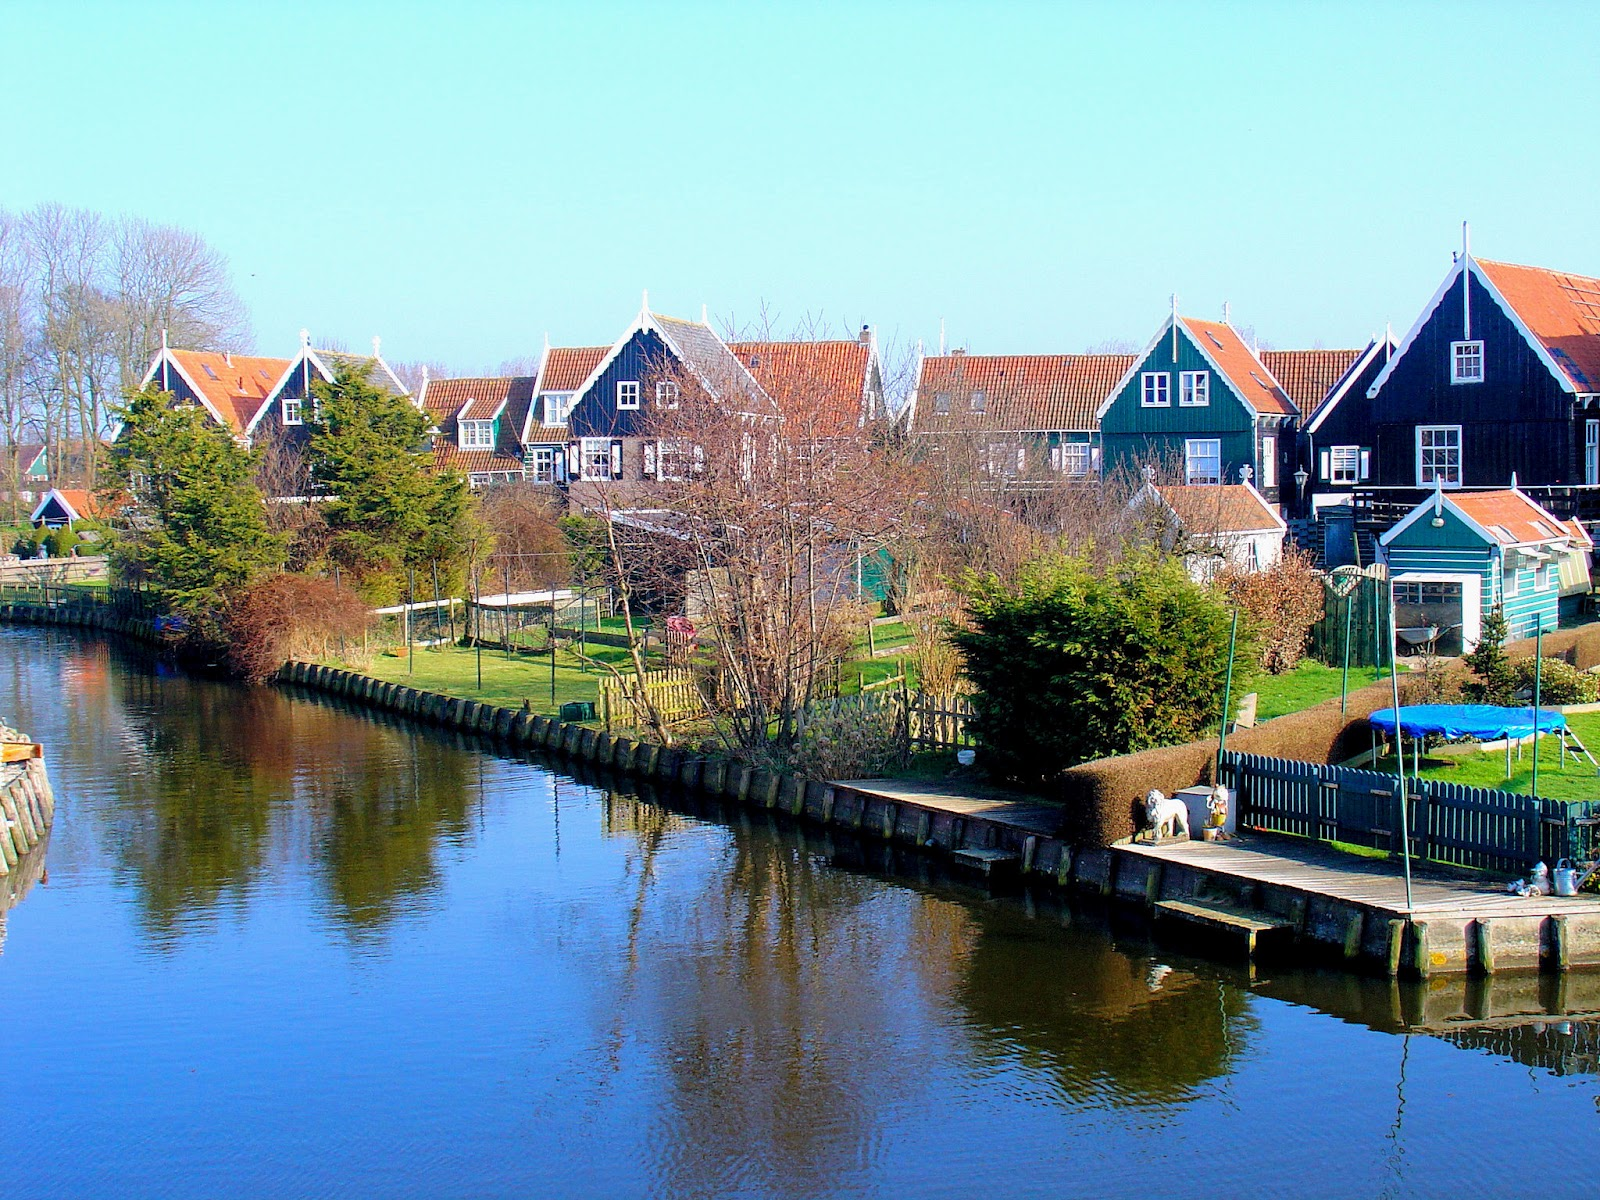 The Splendor Of The Seaside Village Of Marken In The Netherlands